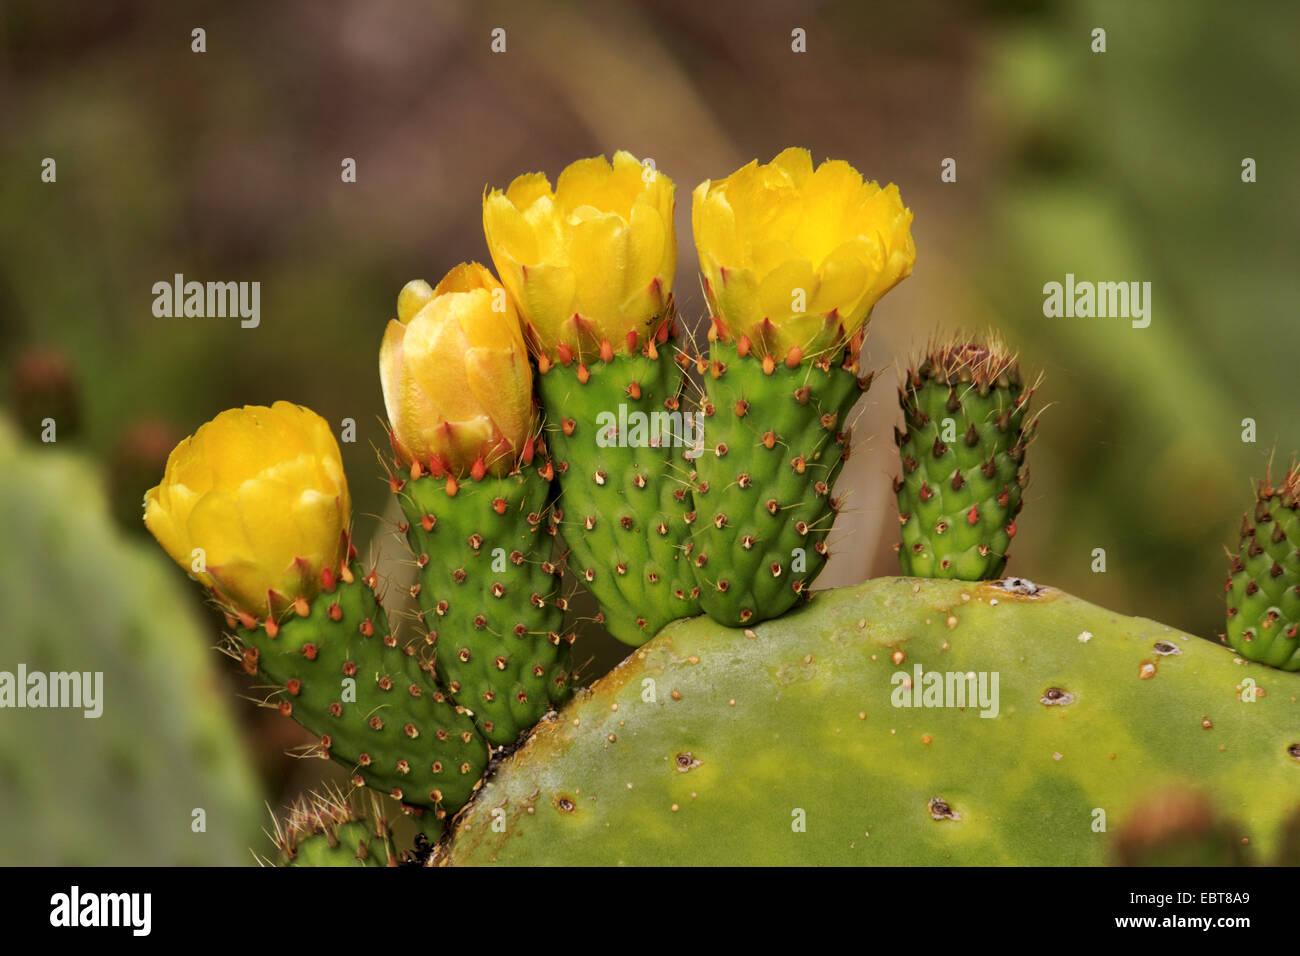 Indische Feigen, Birne Kaktus (Opuntia Ficus-Indica, Opuntia Ficus-Barbarica), mit gelben Blüten, Kanarische Inseln, La Palma Stockfoto